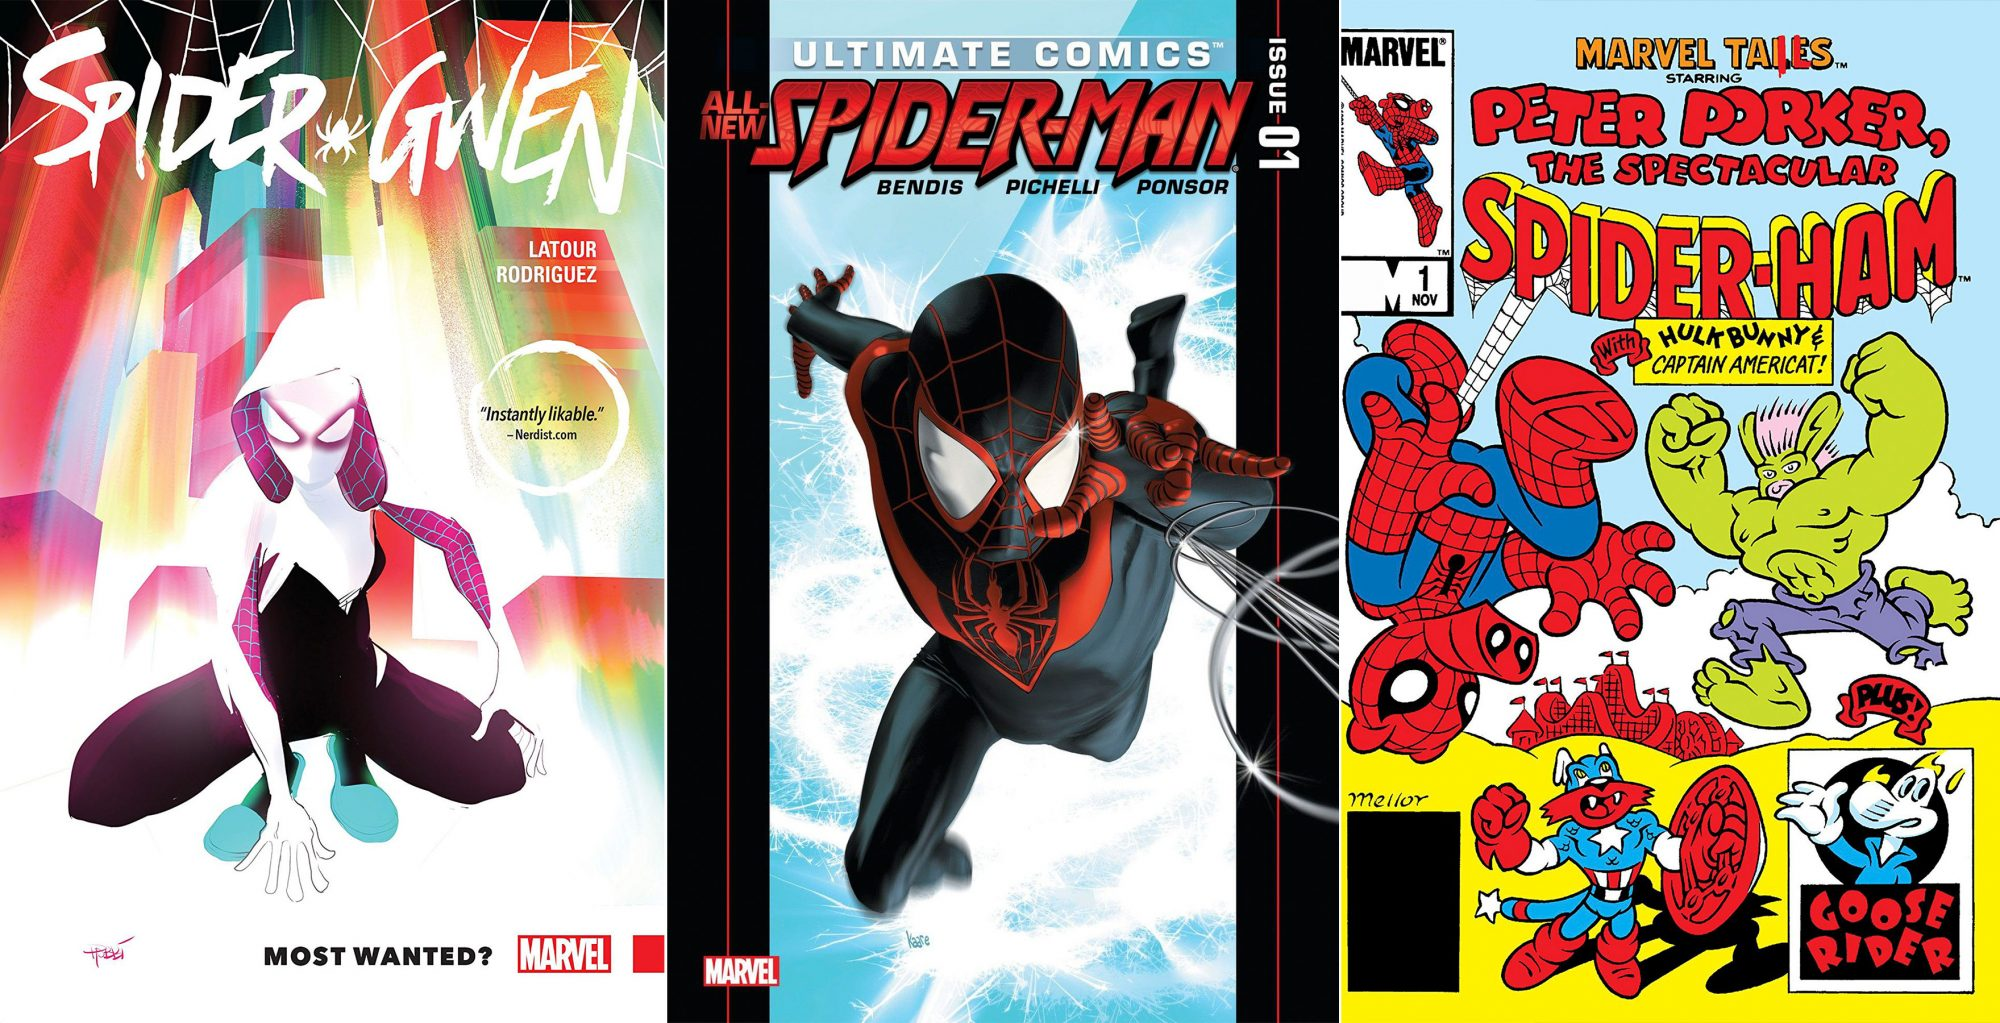 Spidergwen fan art illustration spiderverse spider man comic book illustration artwork comic book art